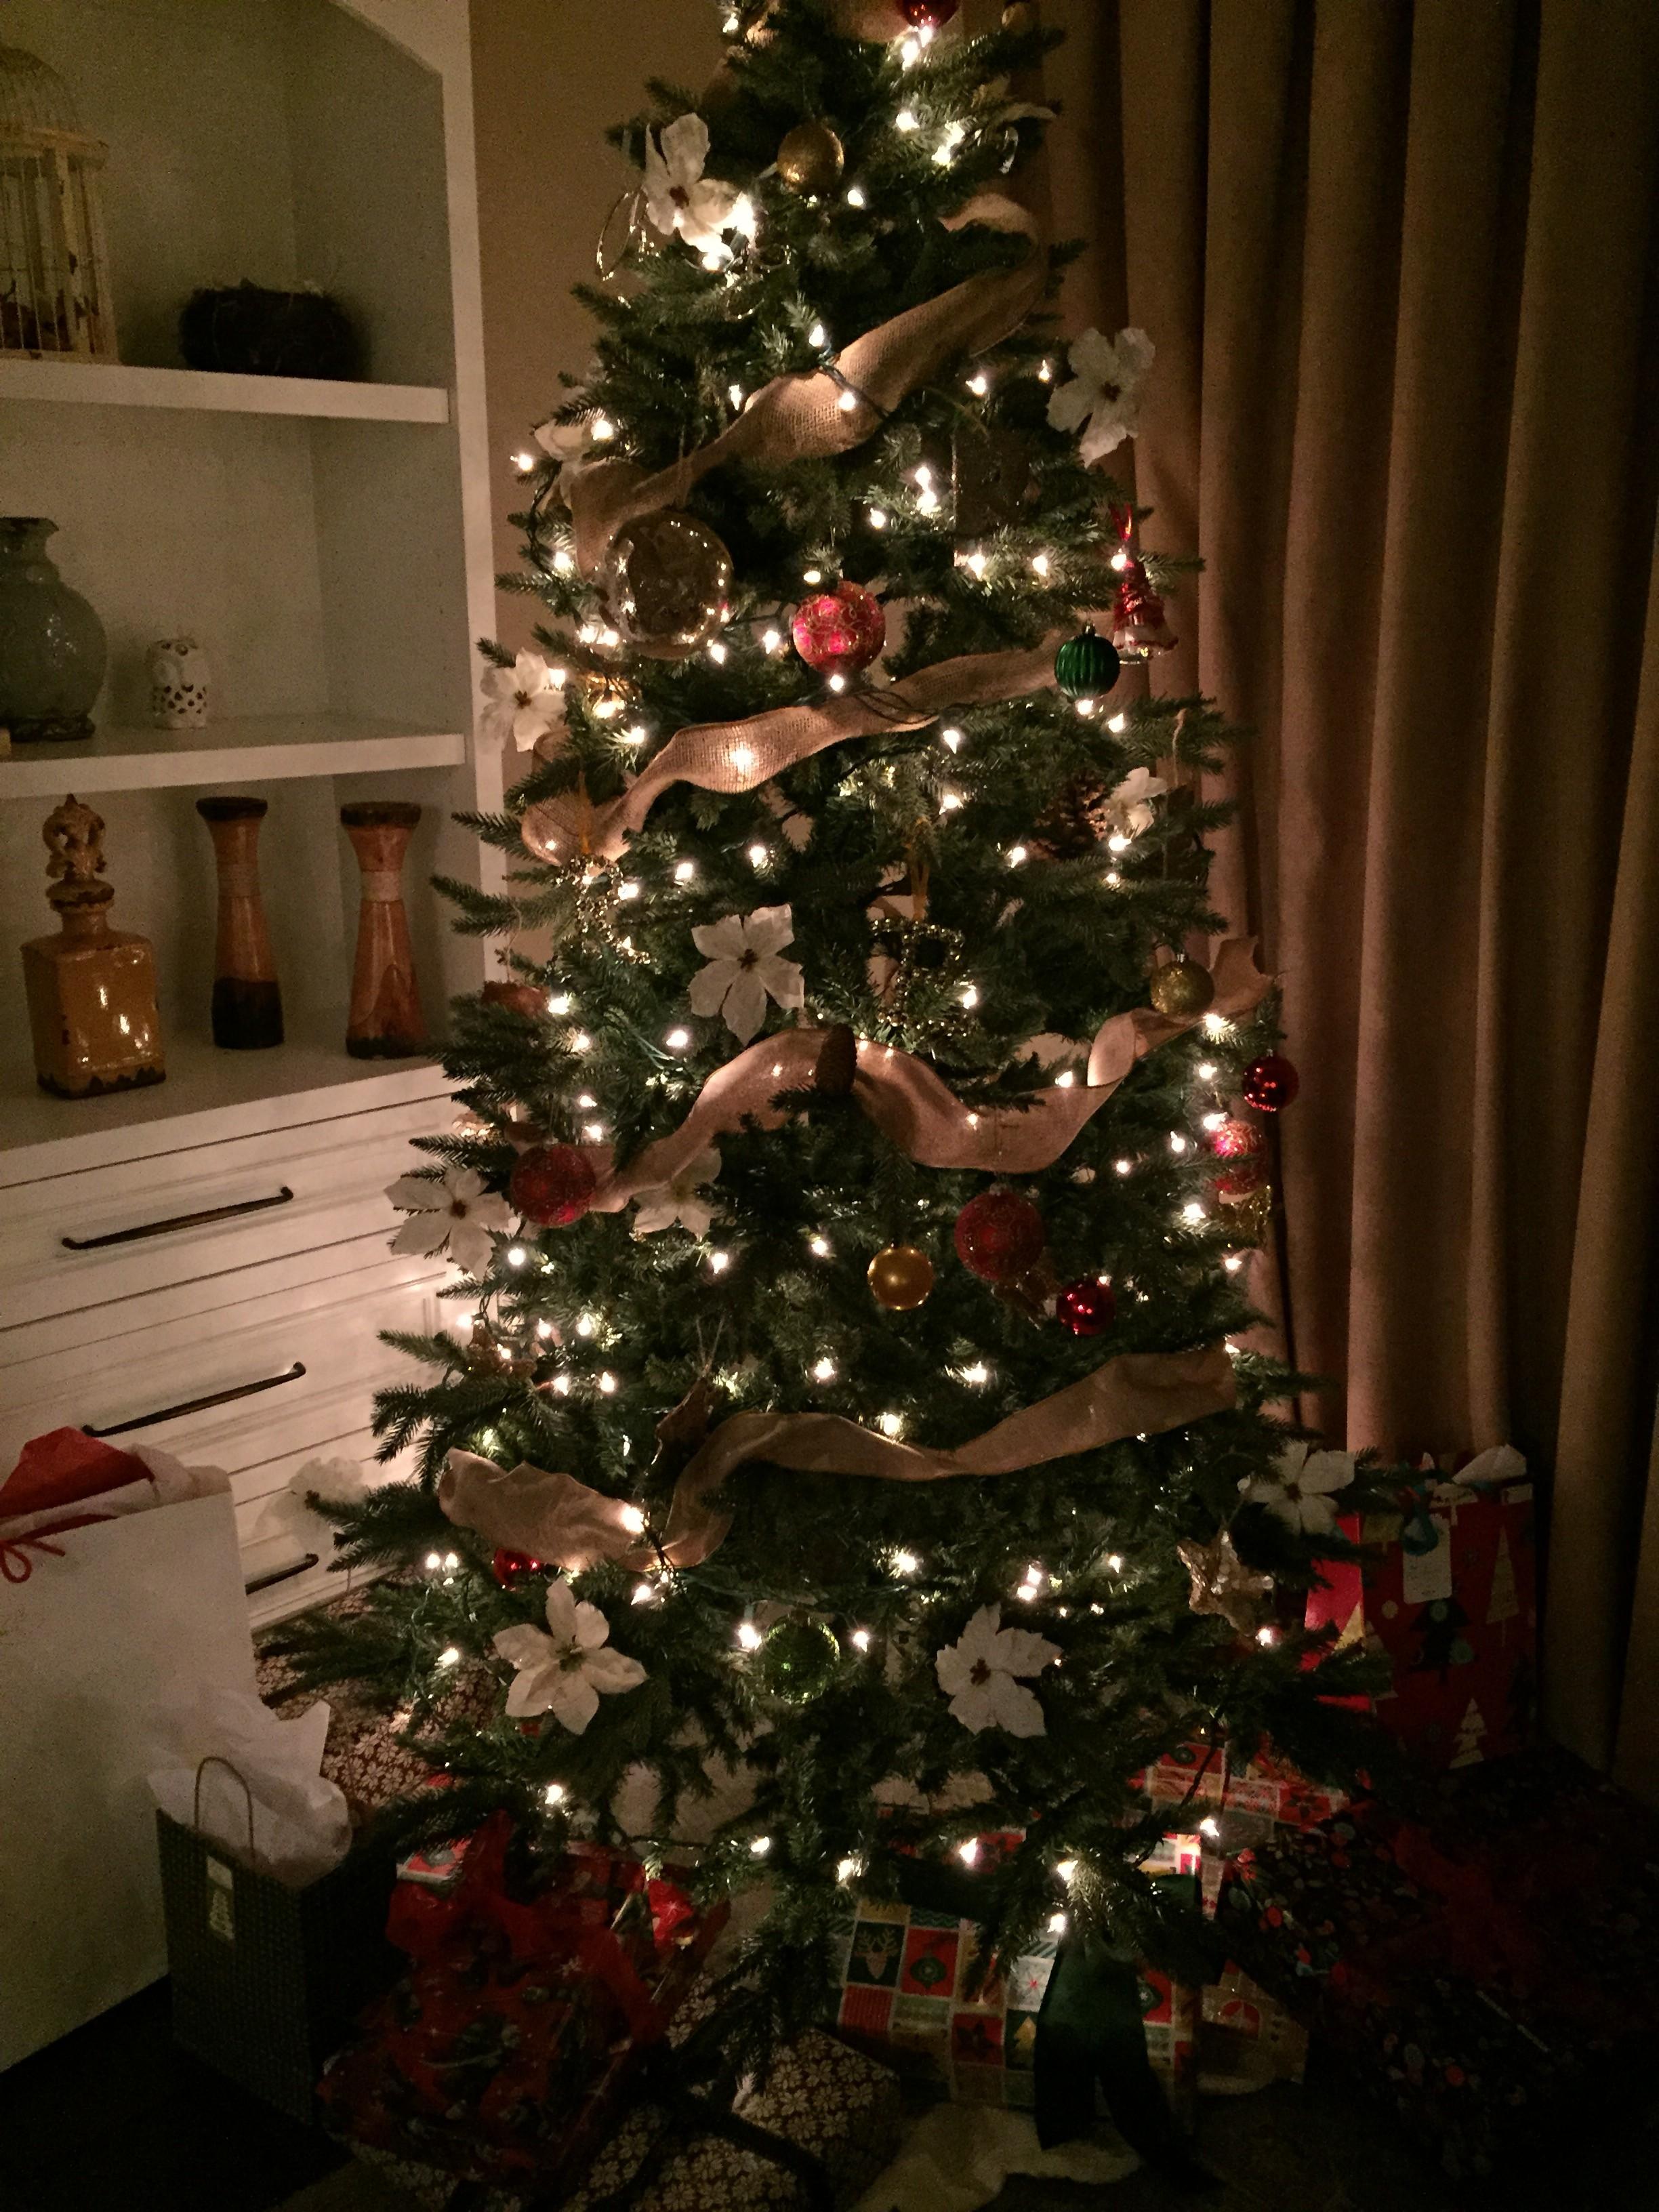 Win a holiday gift box!!